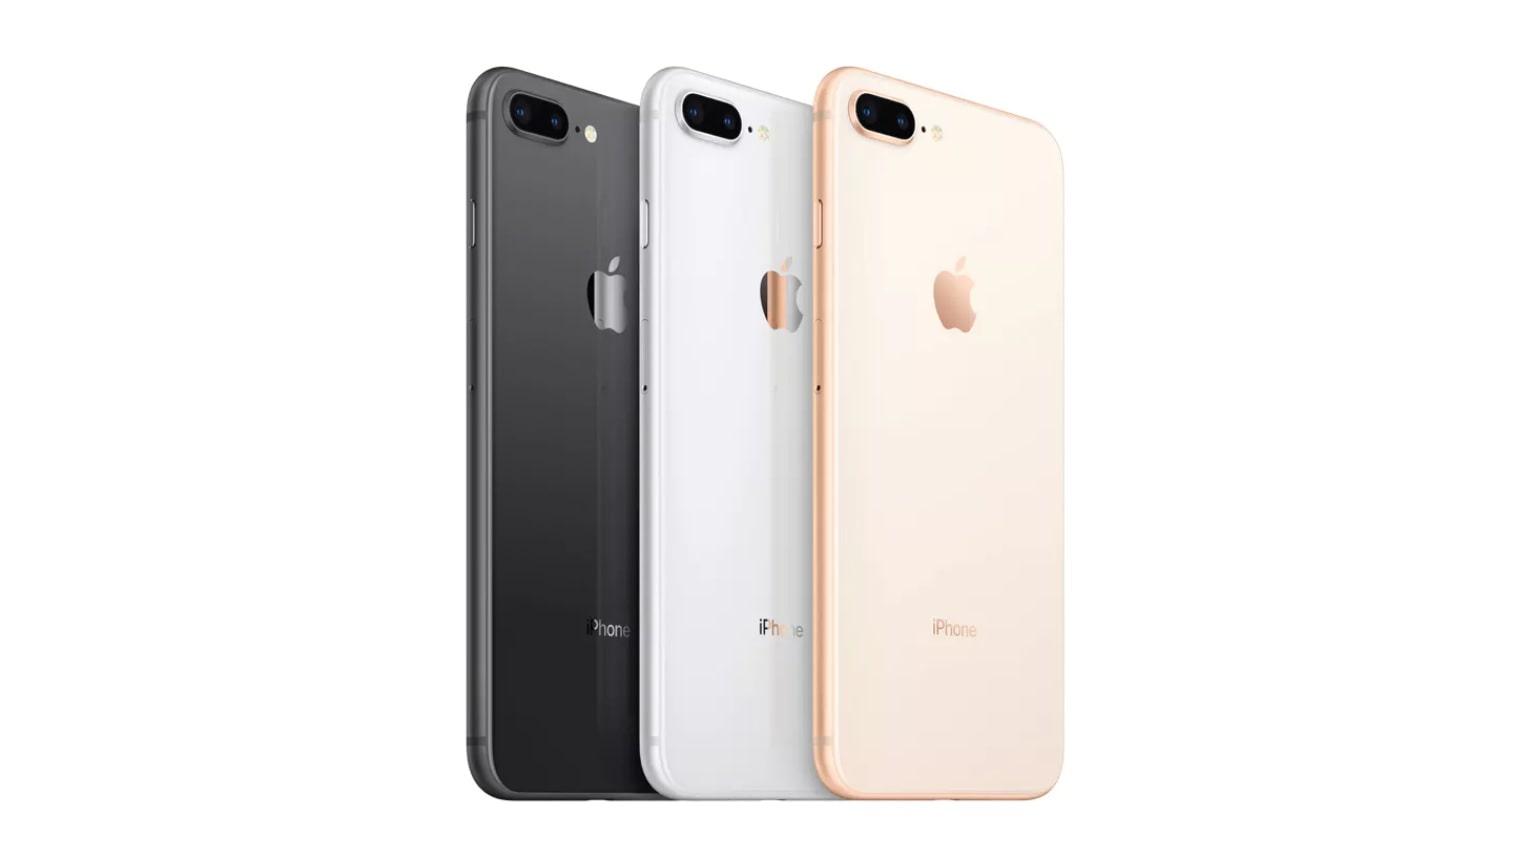 خرید سرویس آنلاک آیکلود آیفون ۸ پلاس – iPhone 8 Plus